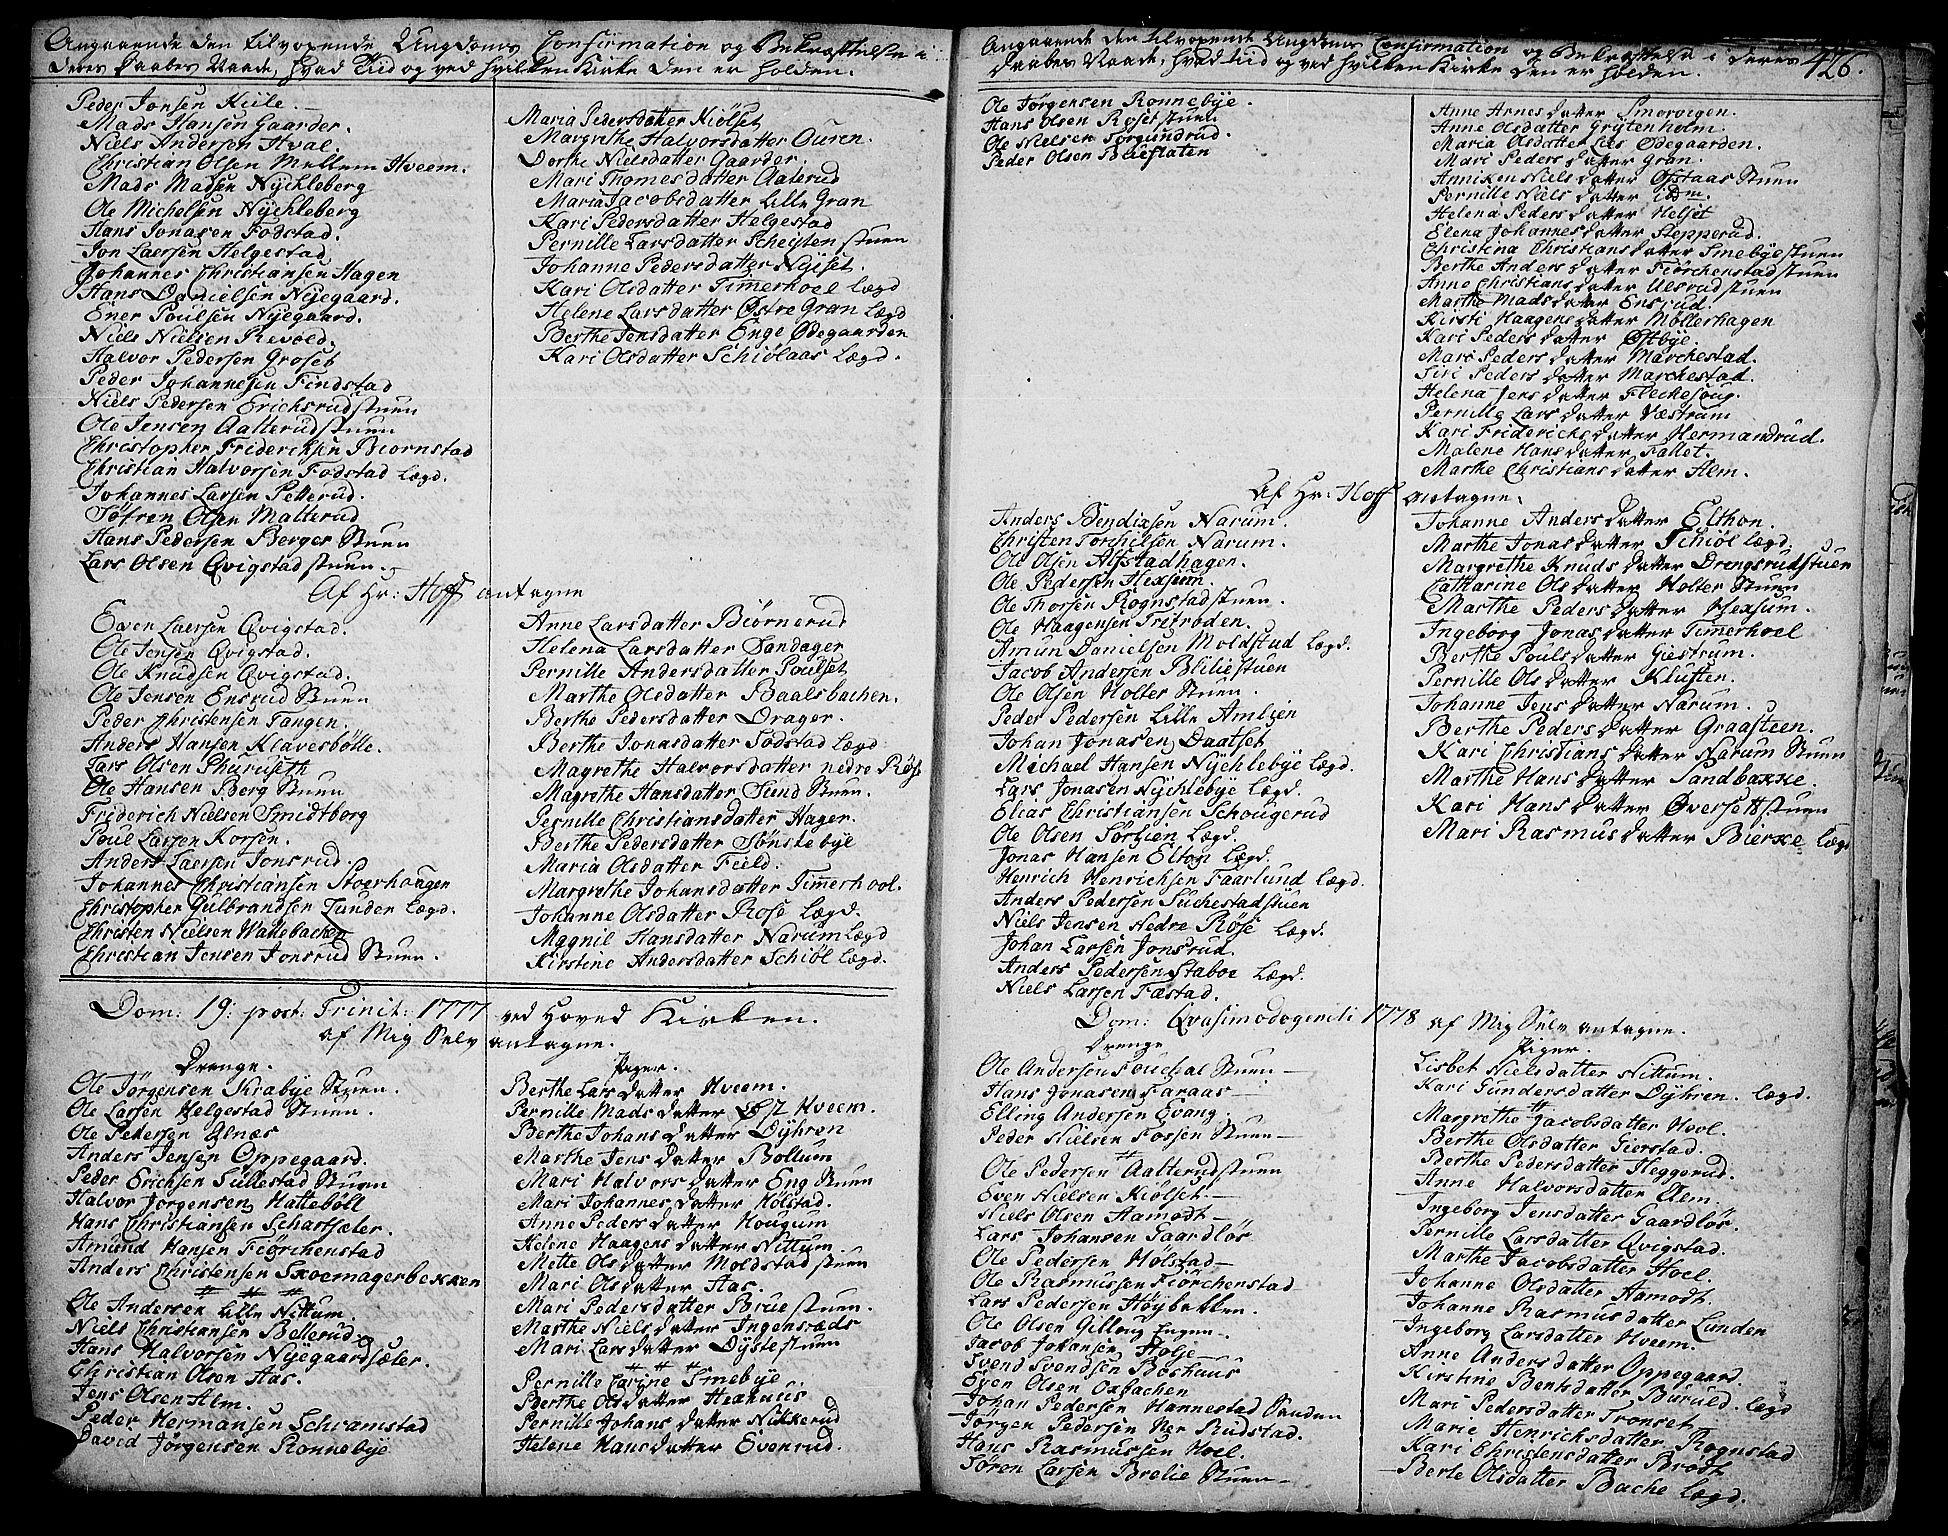 SAH, Toten prestekontor, Ministerialbok nr. 6, 1773-1793, s. 426